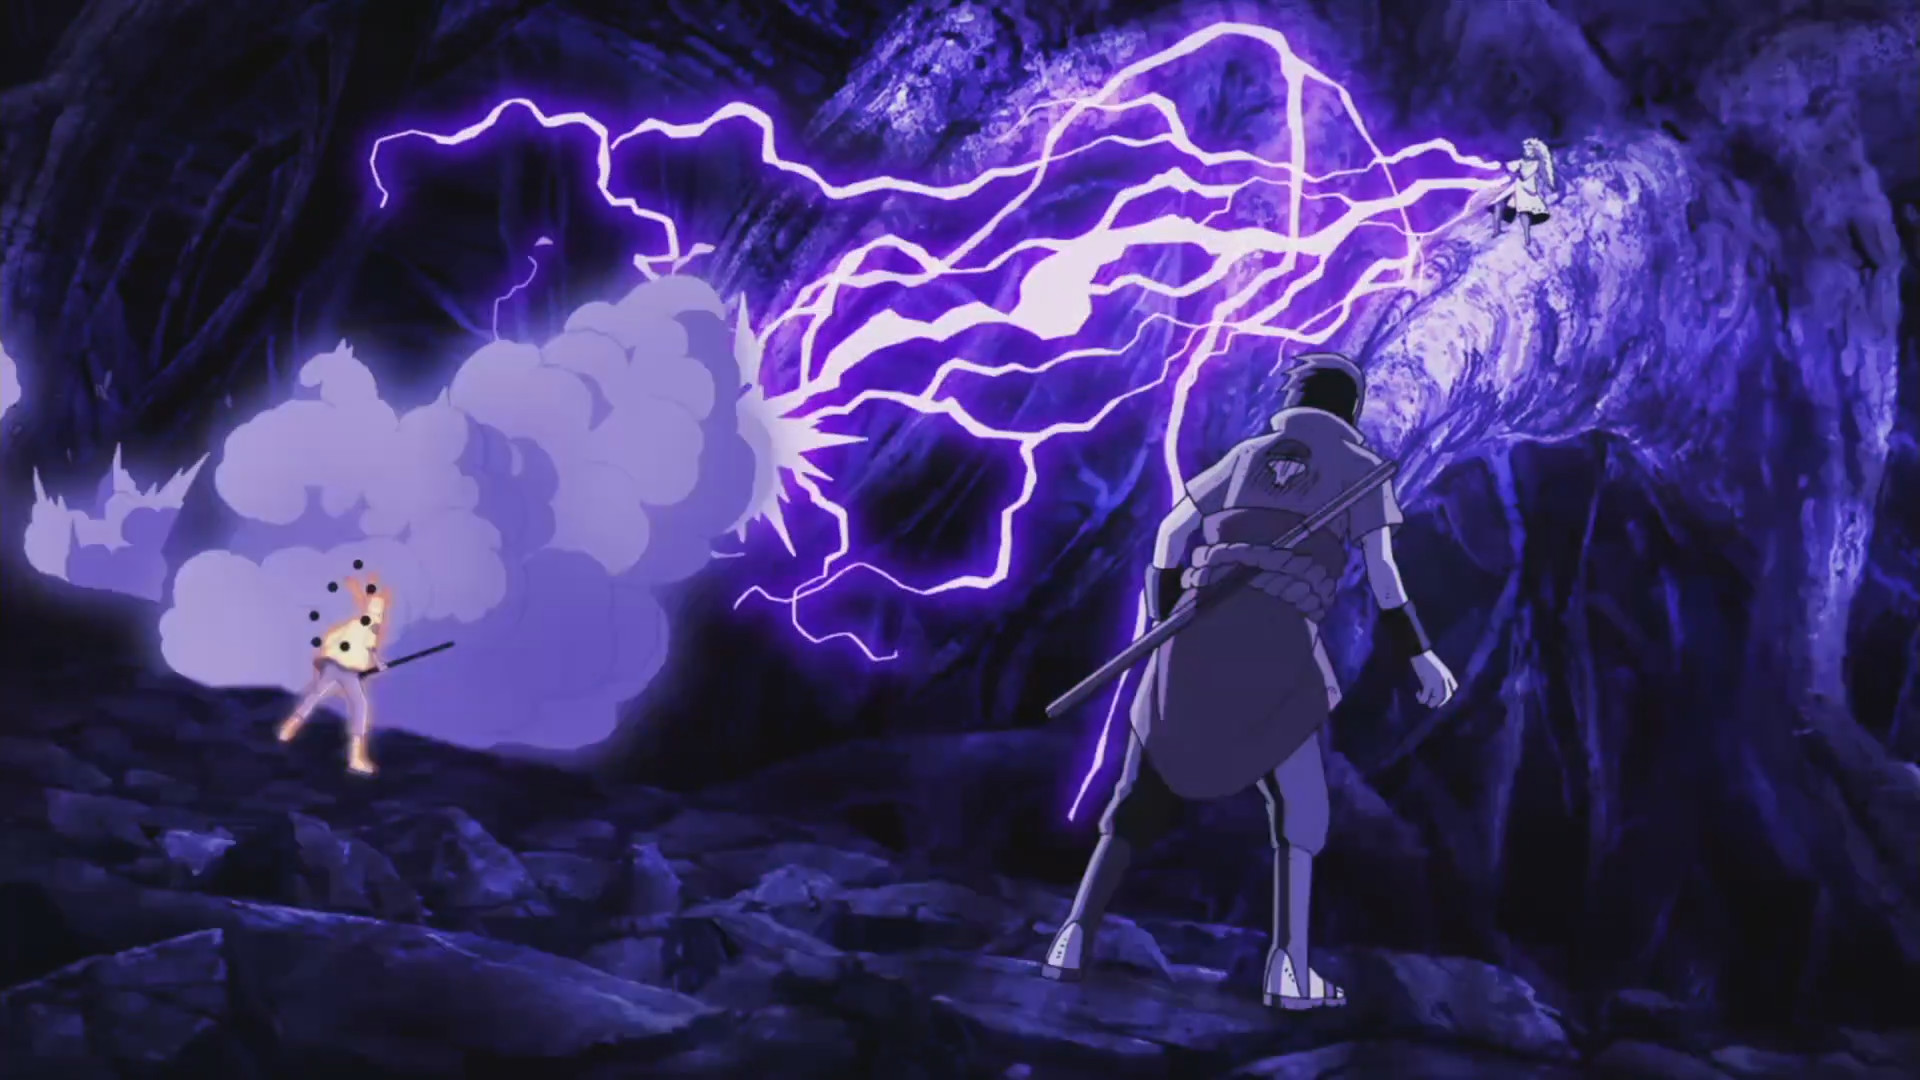 Naruto And Sasuke Vs Madara Wallpapers 49 Pictures